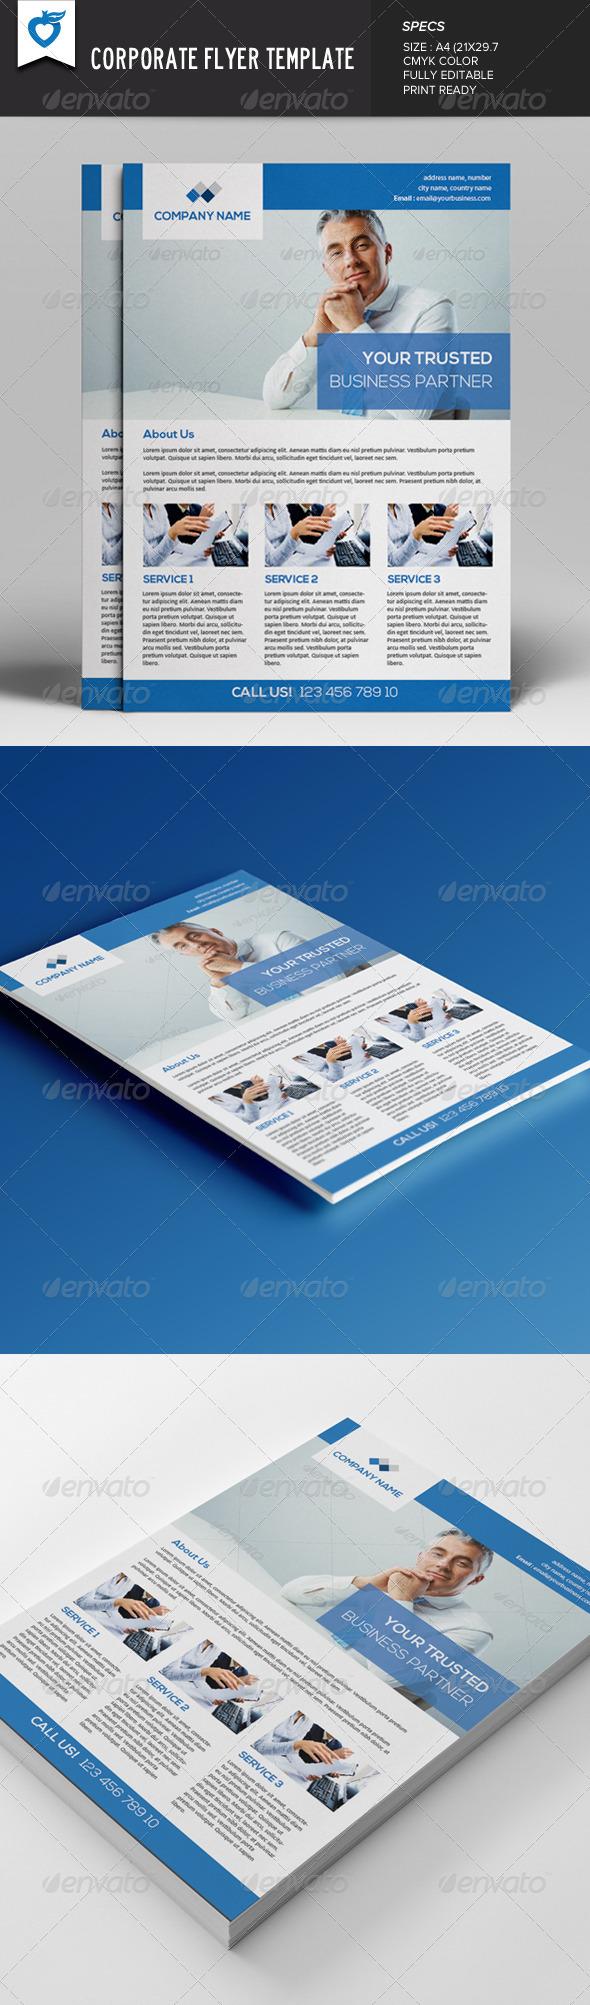 GraphicRiver Corporate Flyer v3 7873943